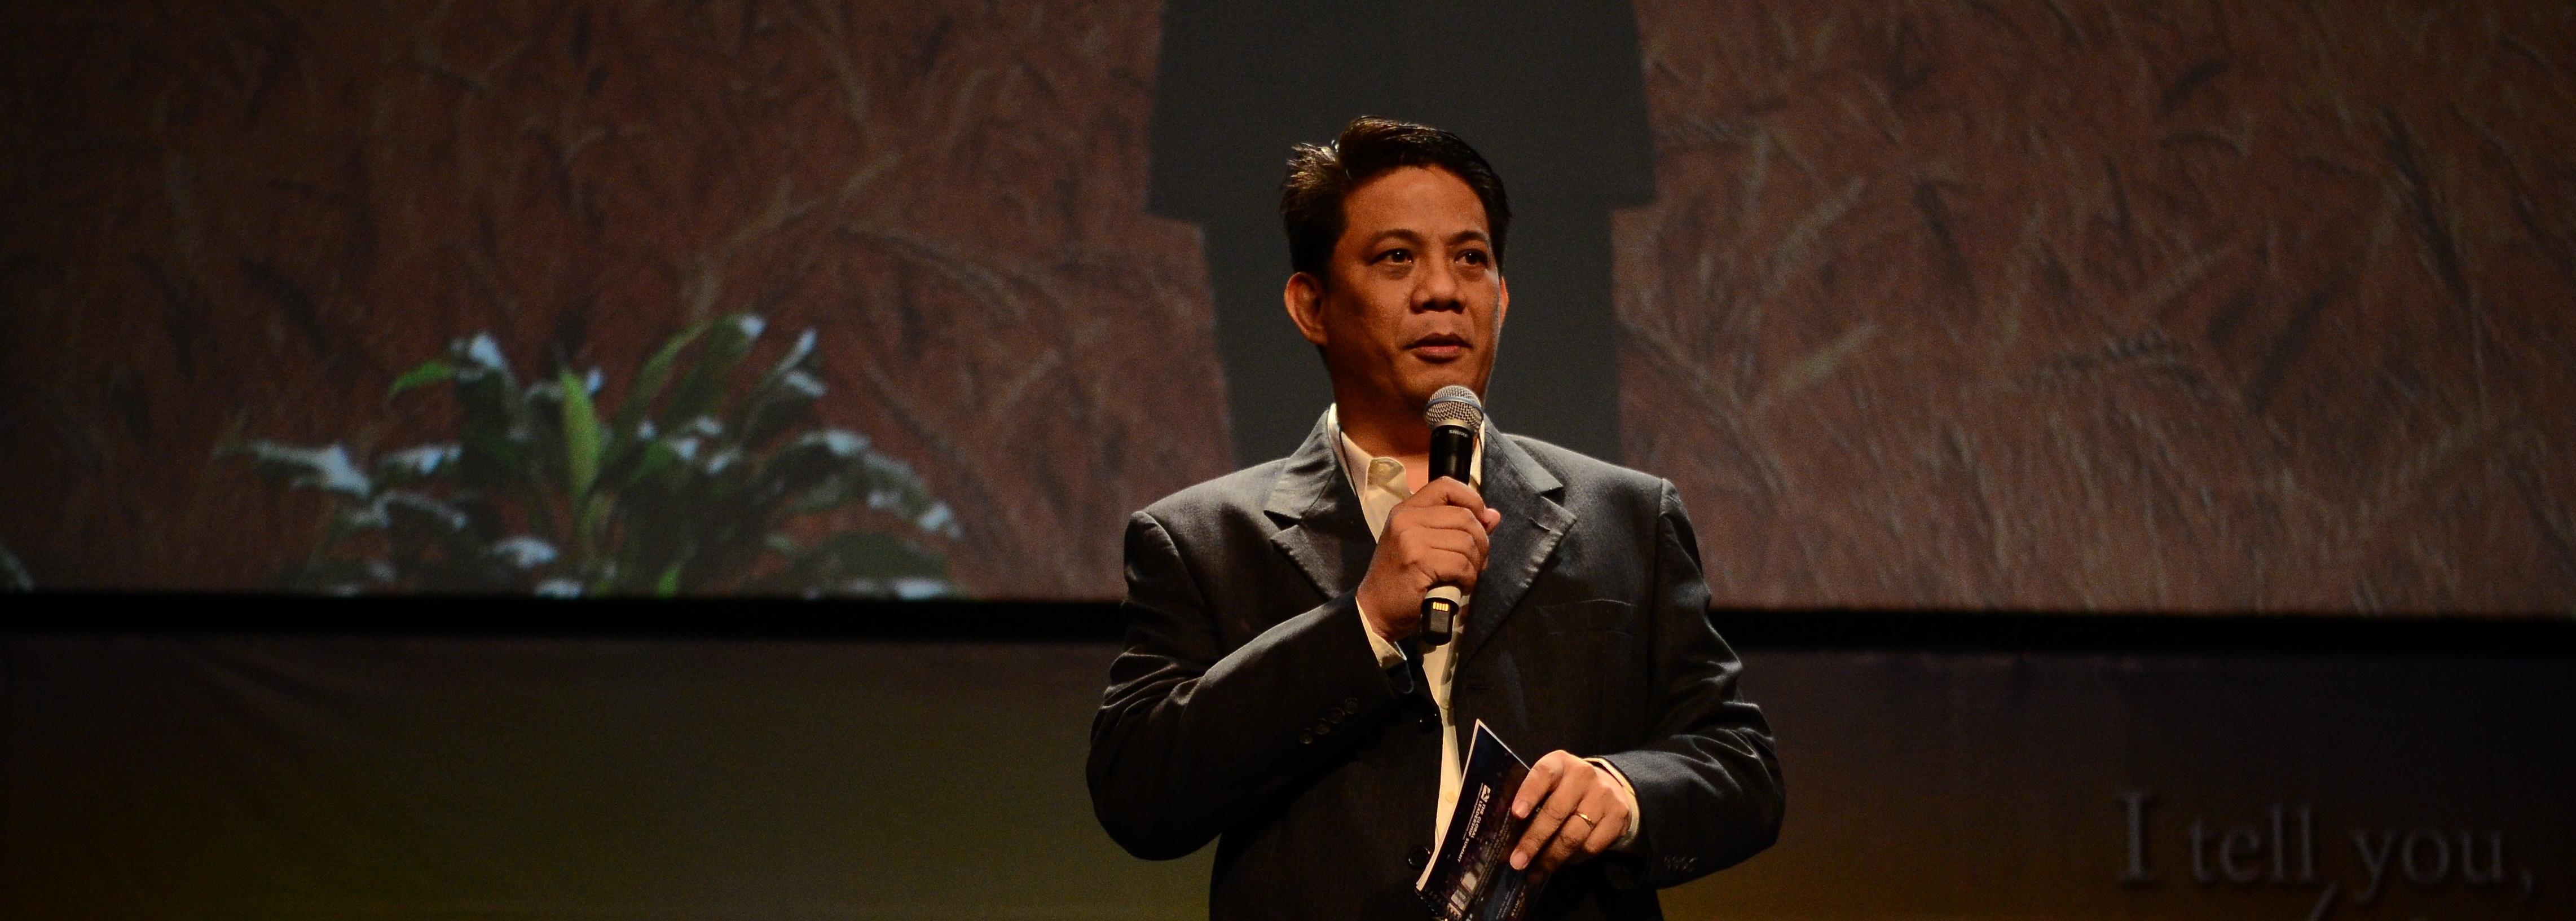 PB at GLS 2014 Manila Pic 2